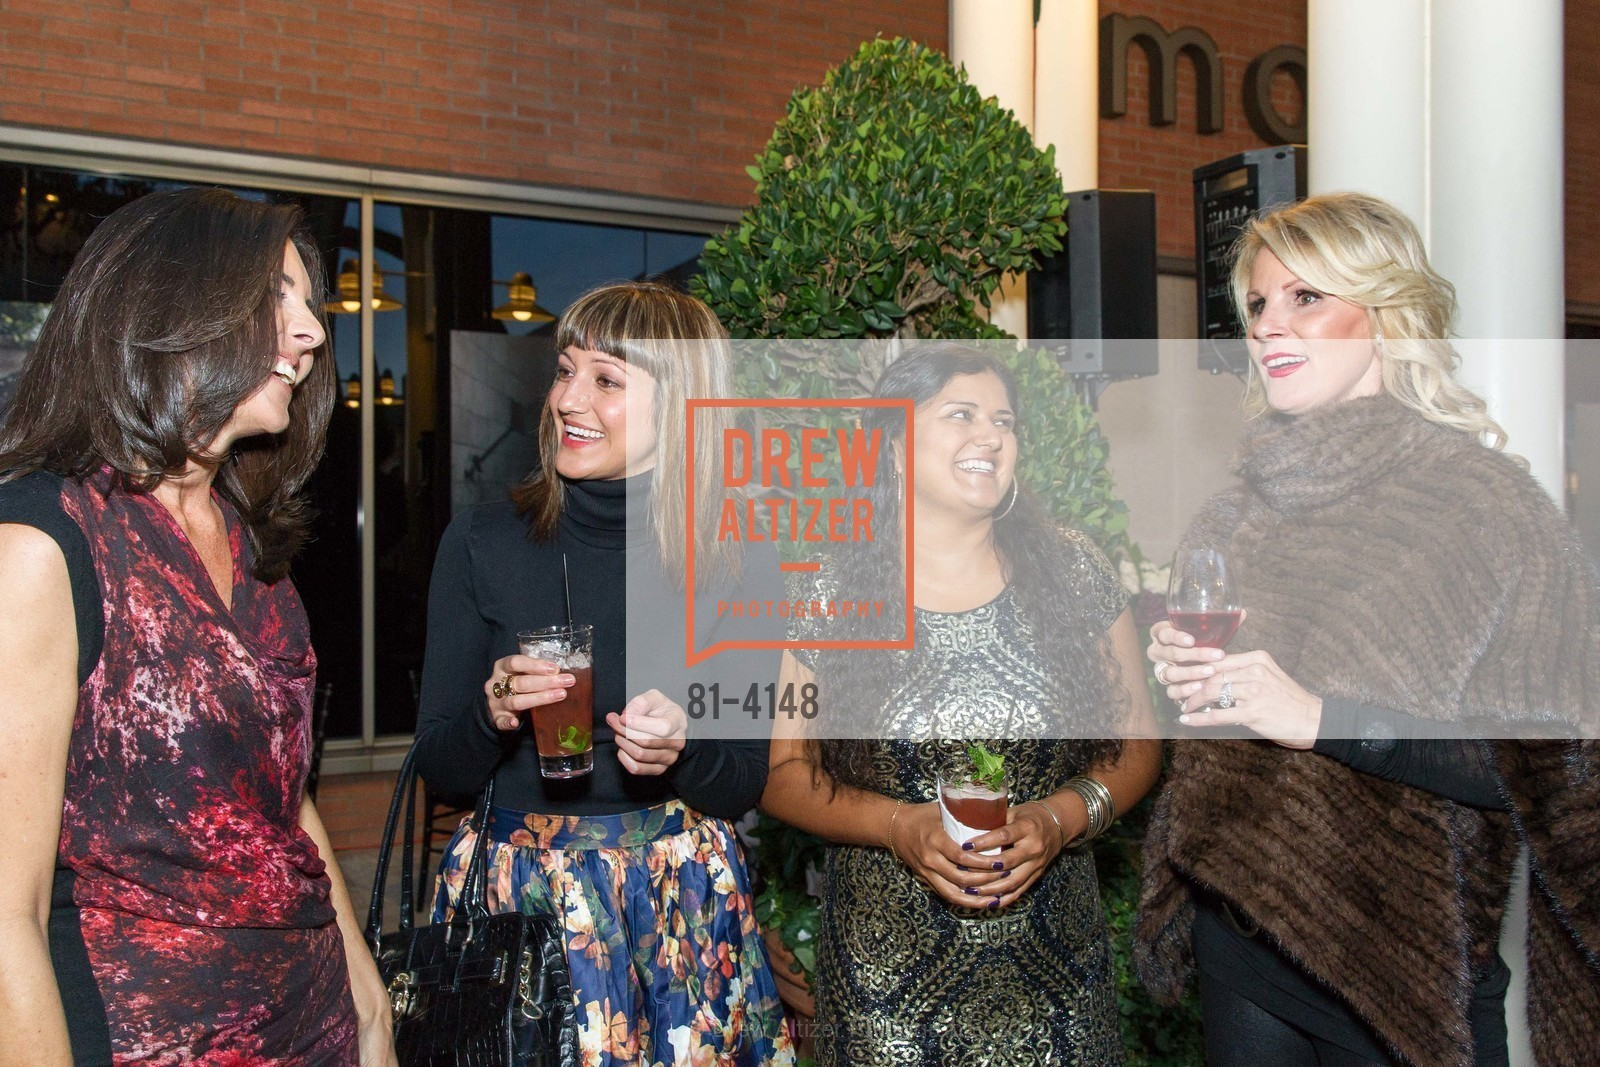 Michele Sharkey, Monique Lombardelli, Avani Patel, Sam Bowman, Photo #81-4148